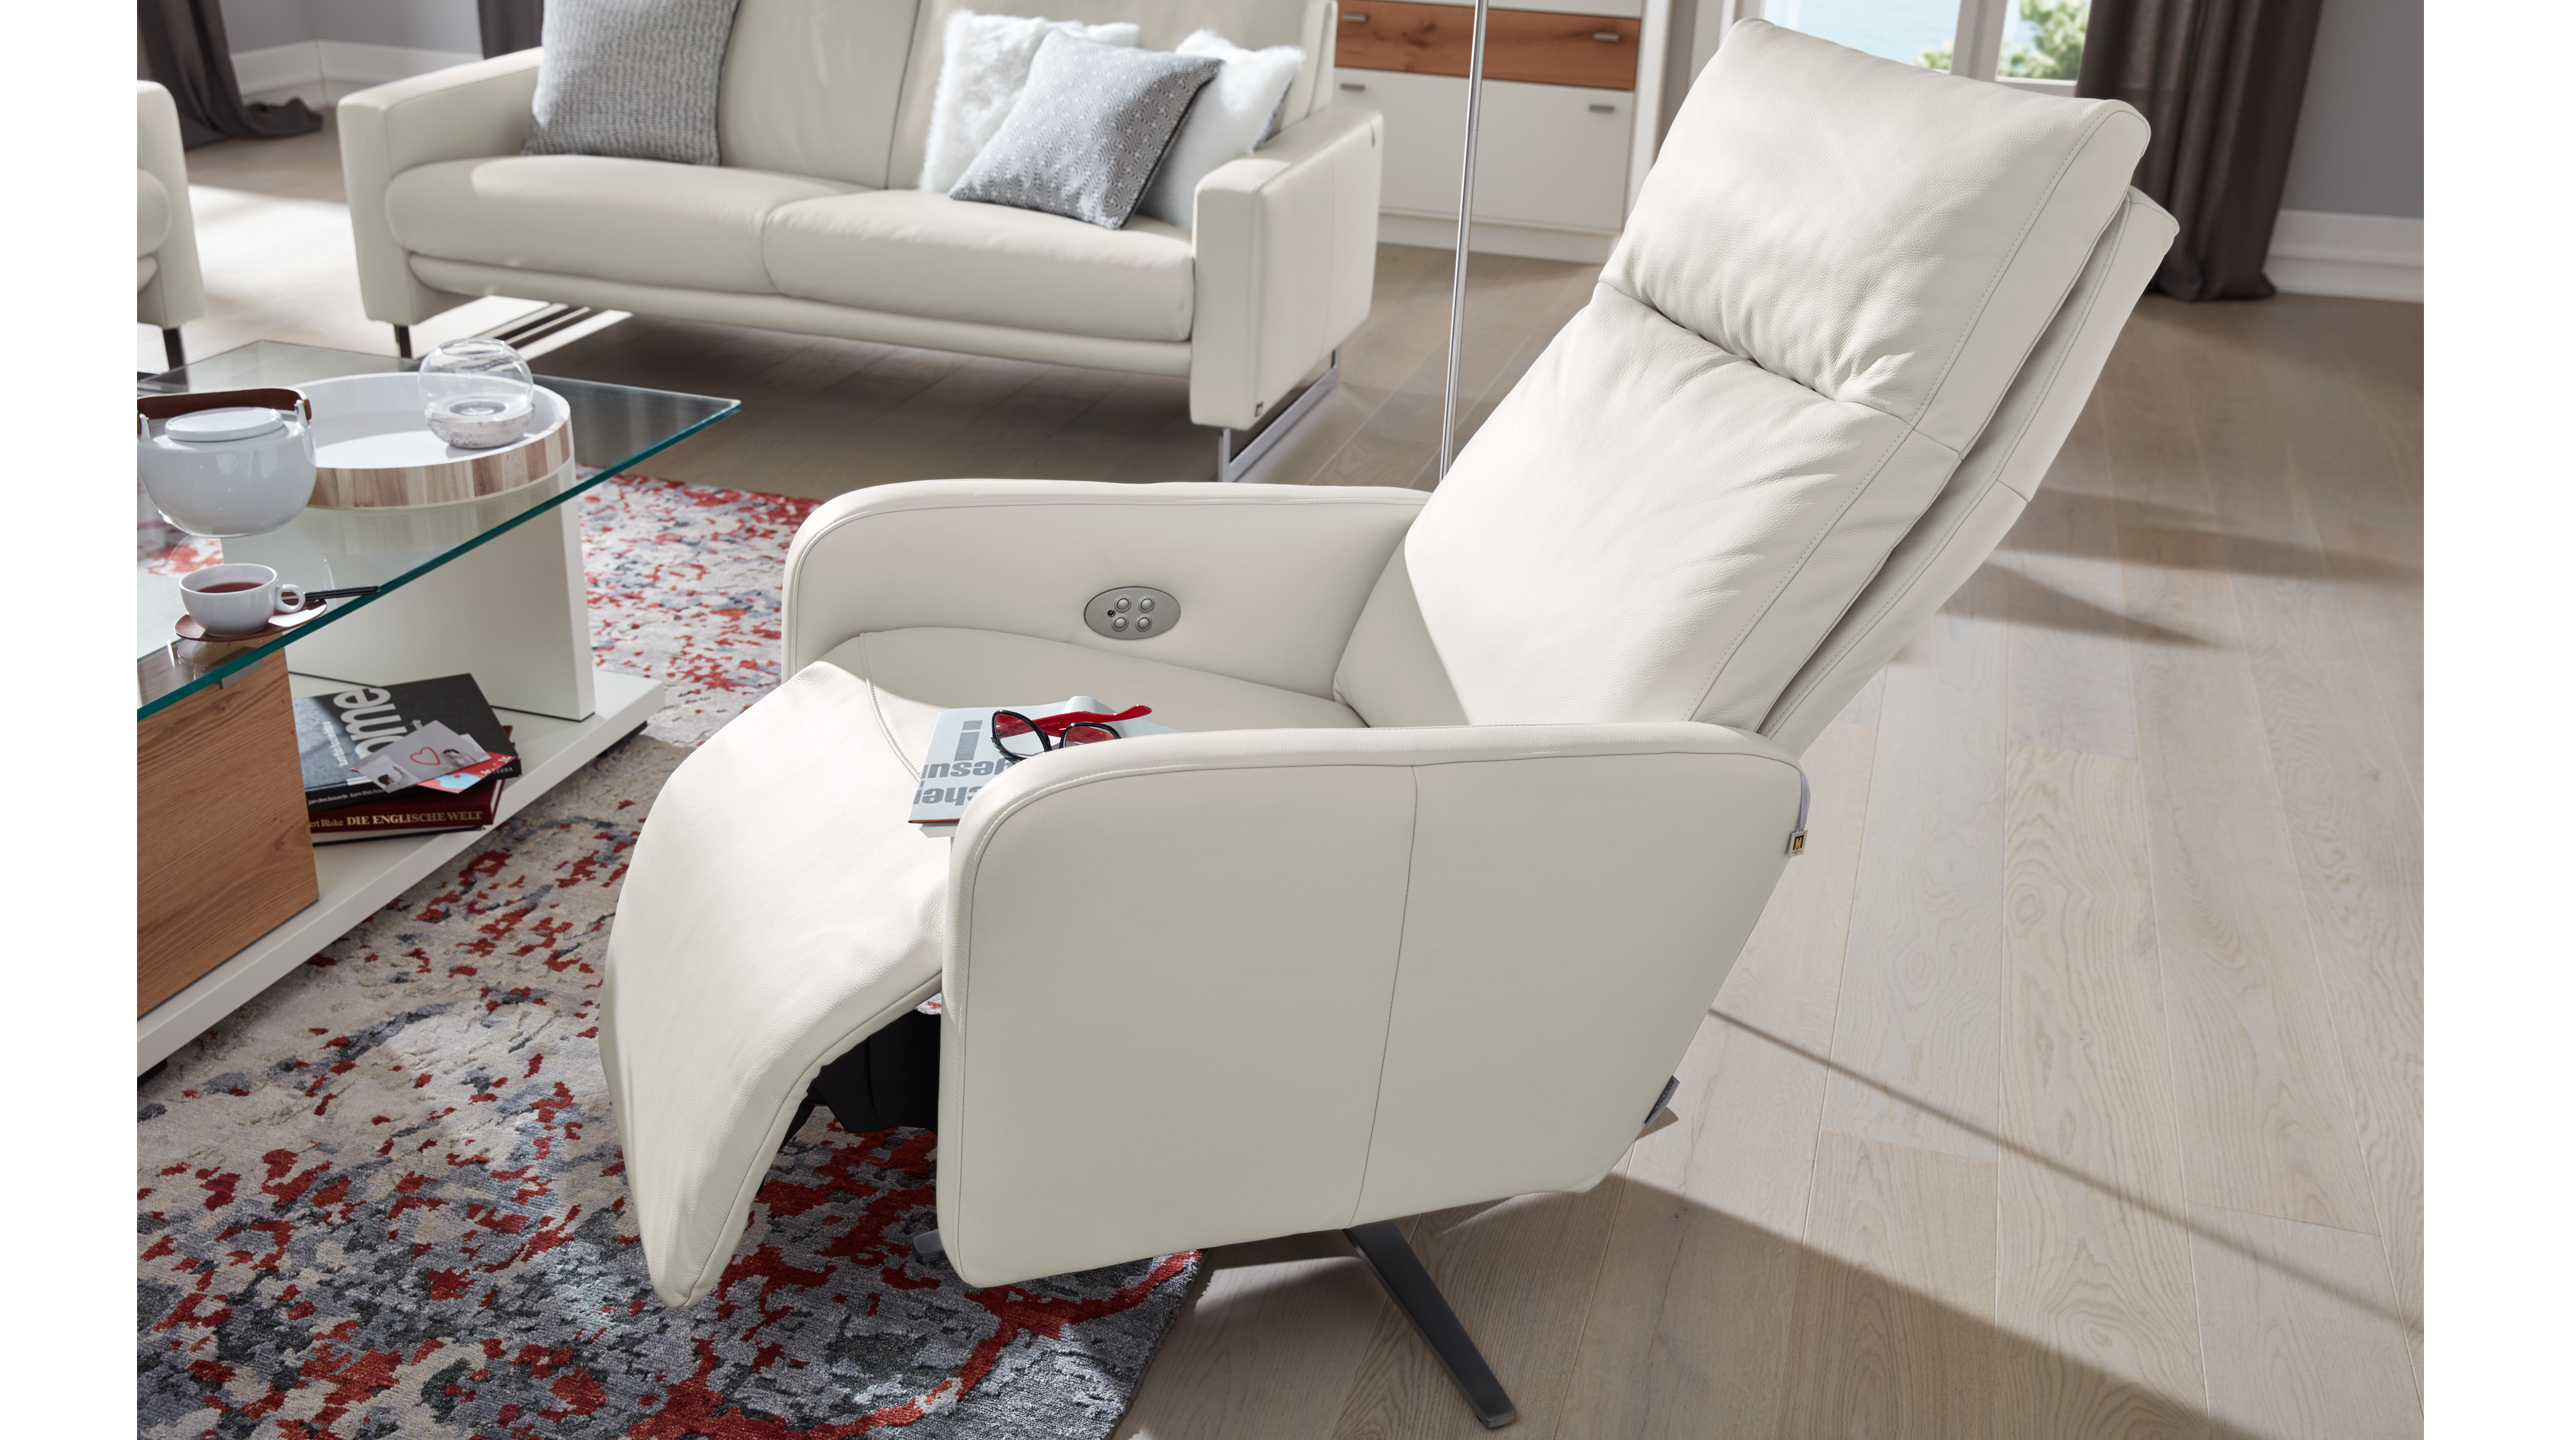 Interliving Sessel Serie 4501 - mit Relaxfunktion | Möbel